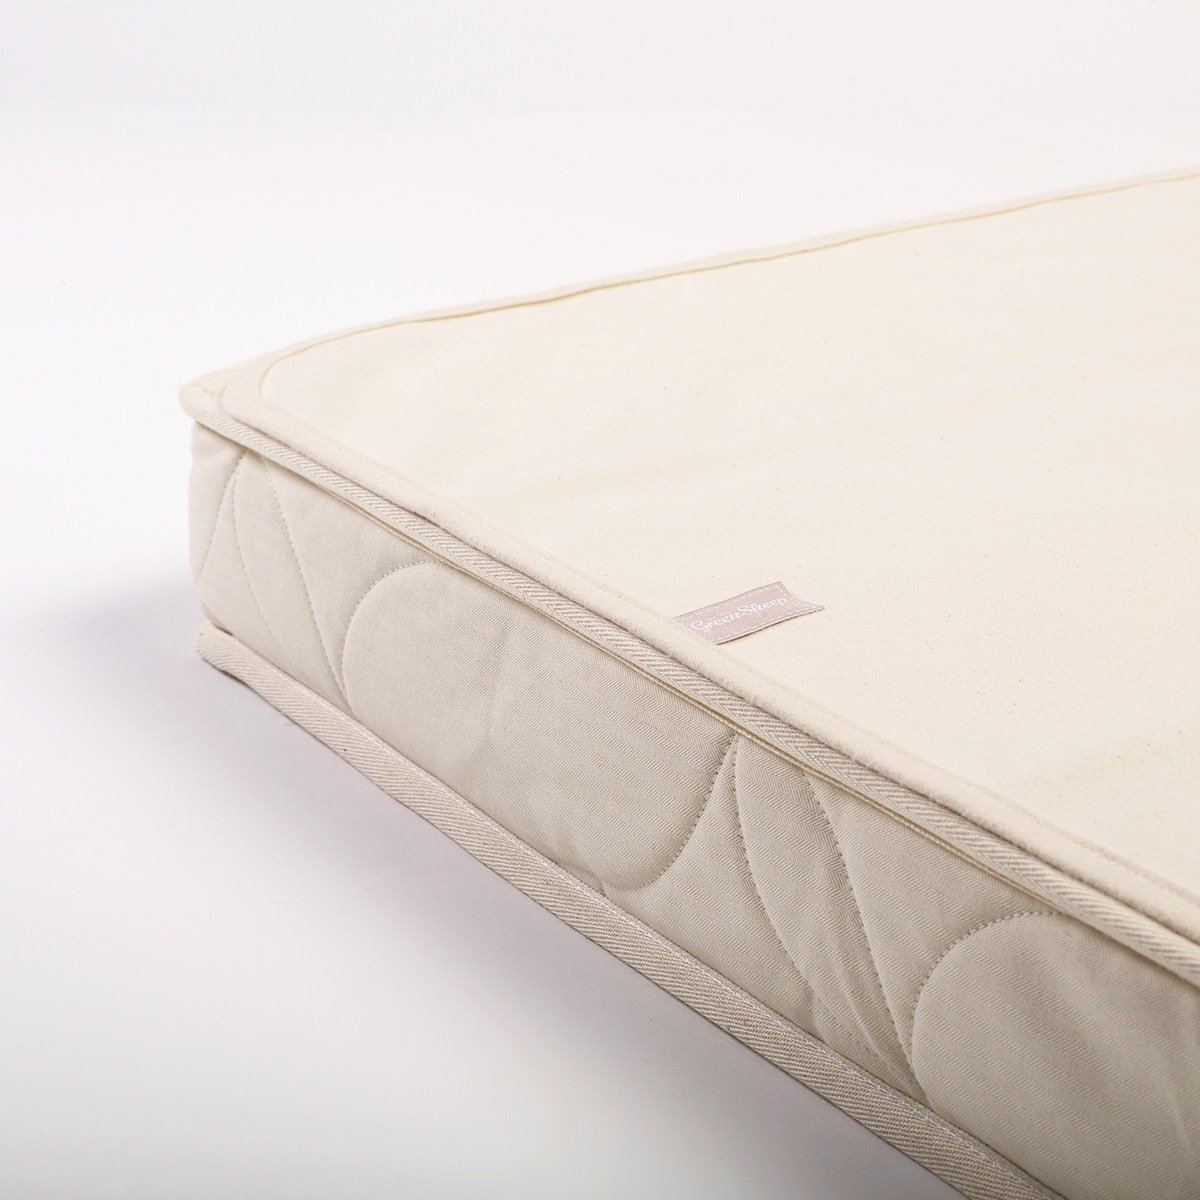 Organic Cot Bed Mattress Protector 70x140cm The Little Green Sheep